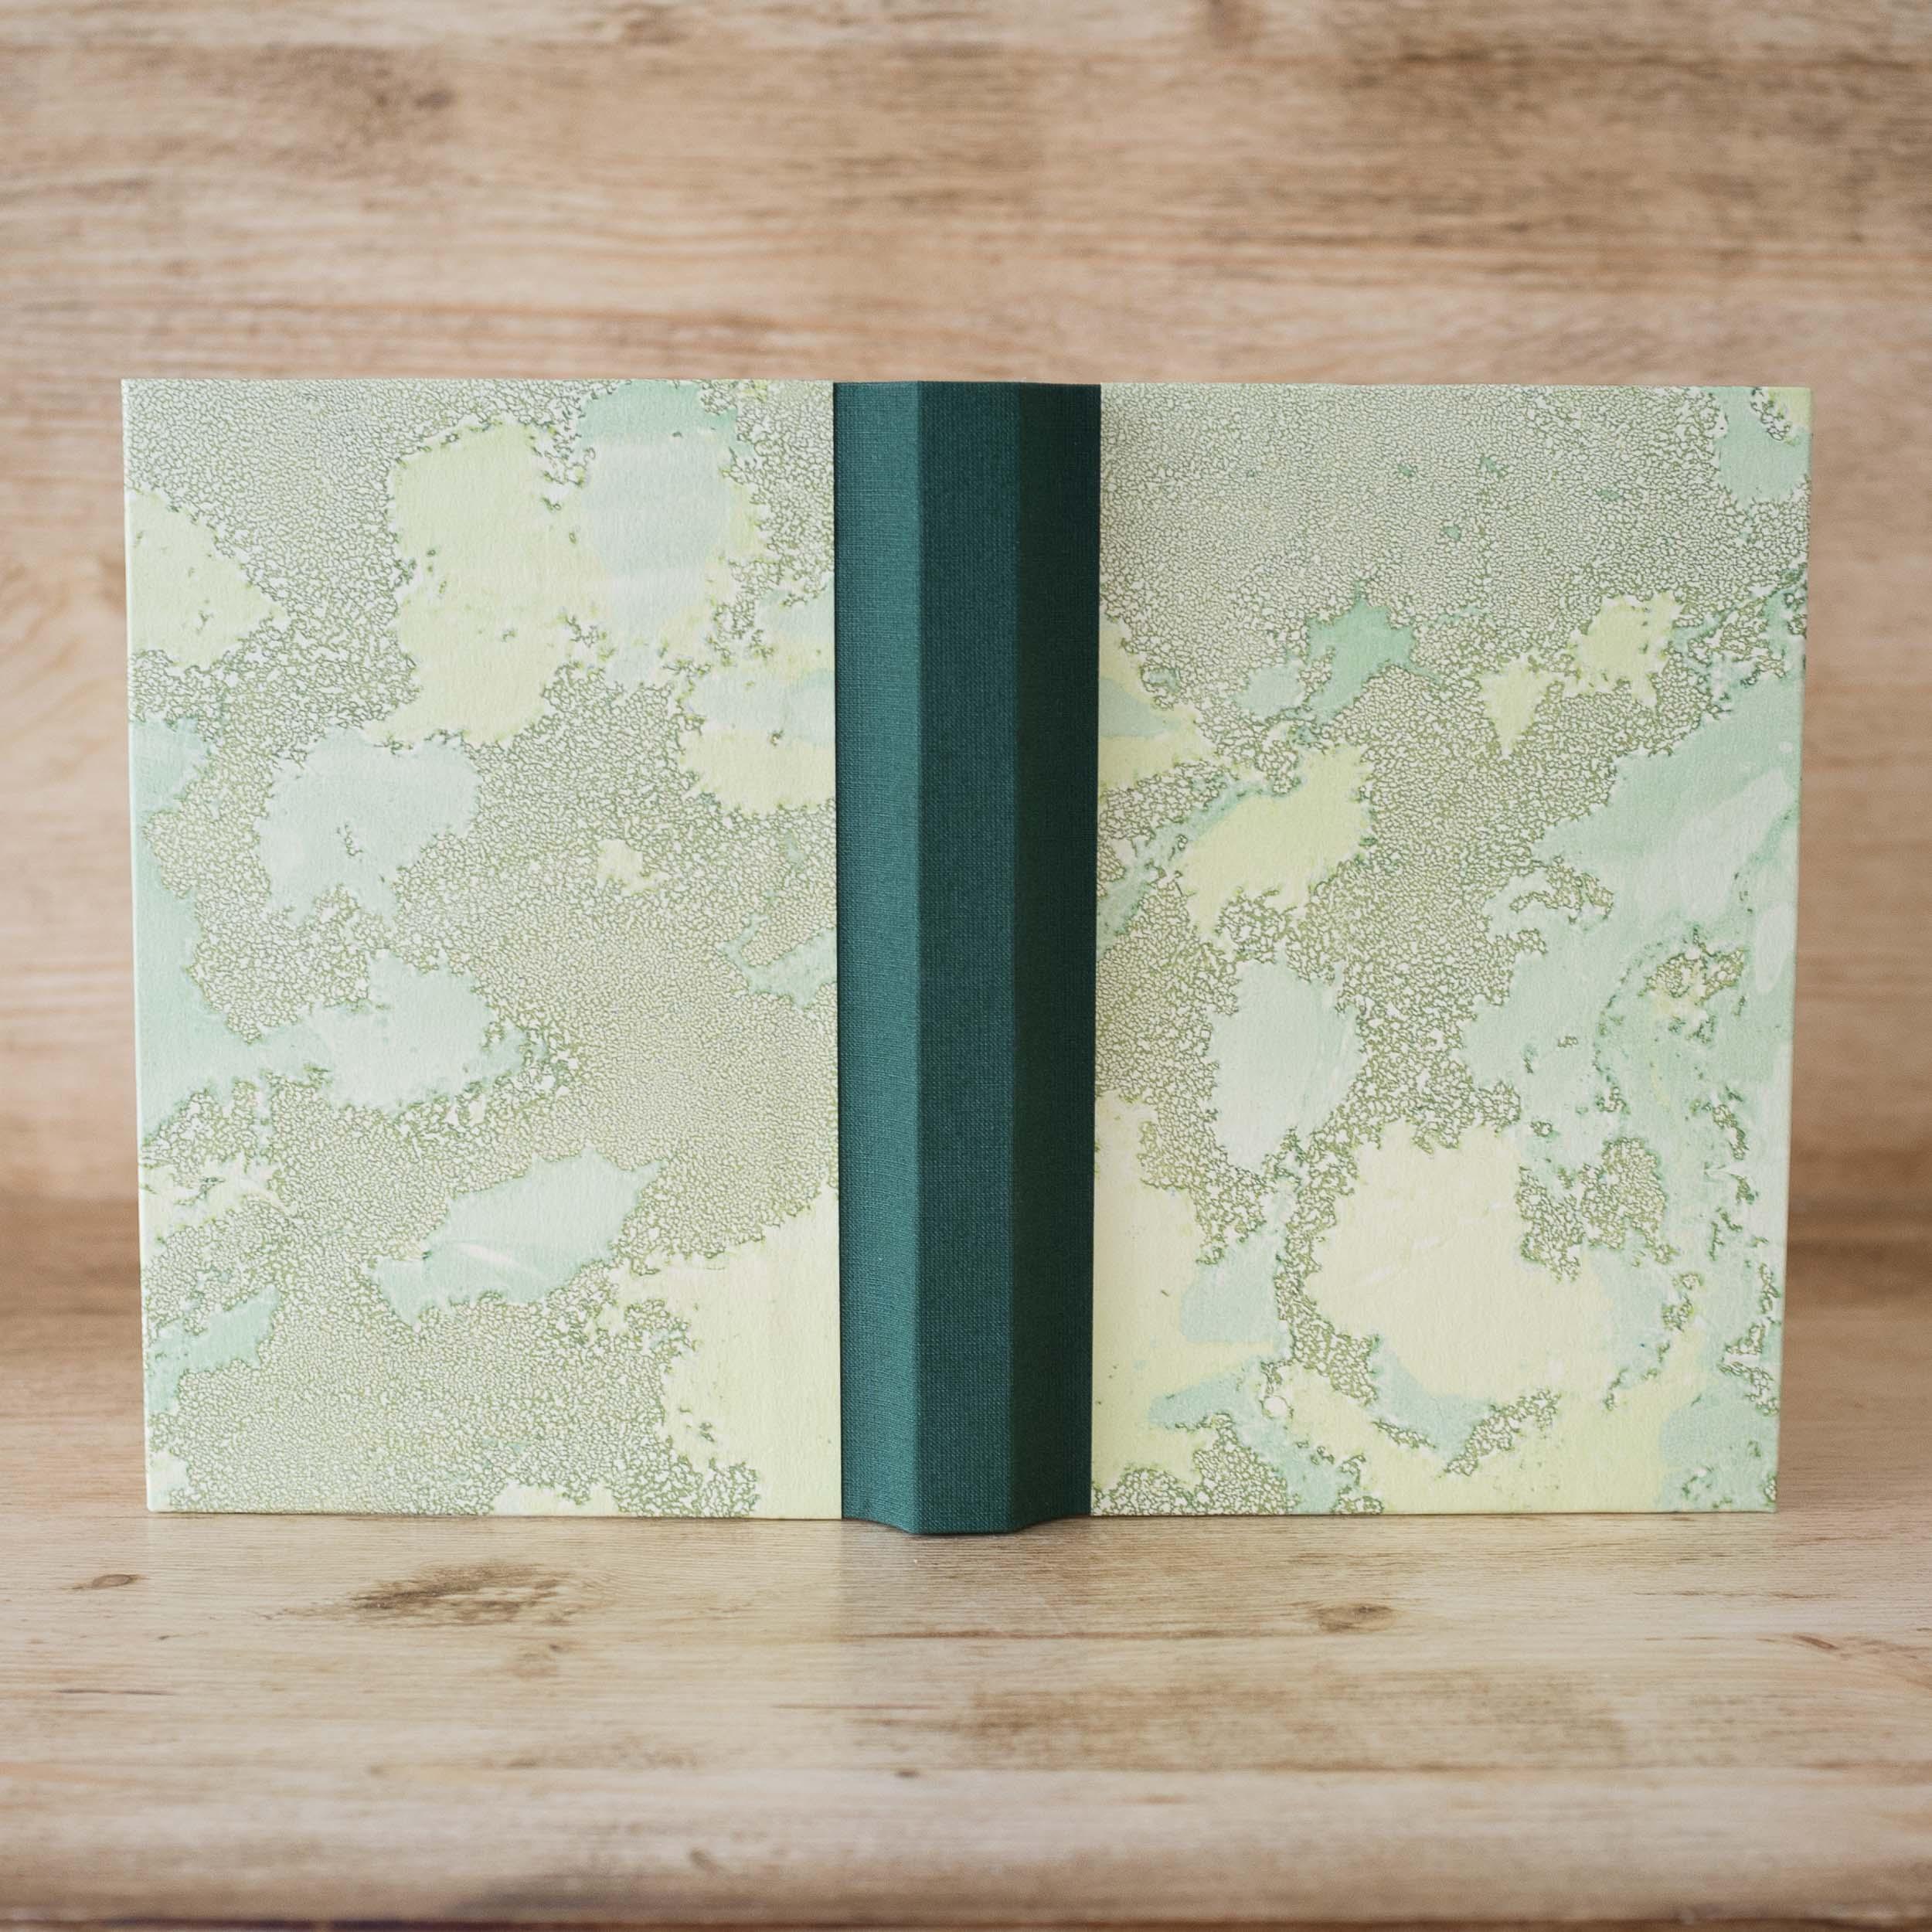 Camel Winter Hand Bound Books-4.jpg